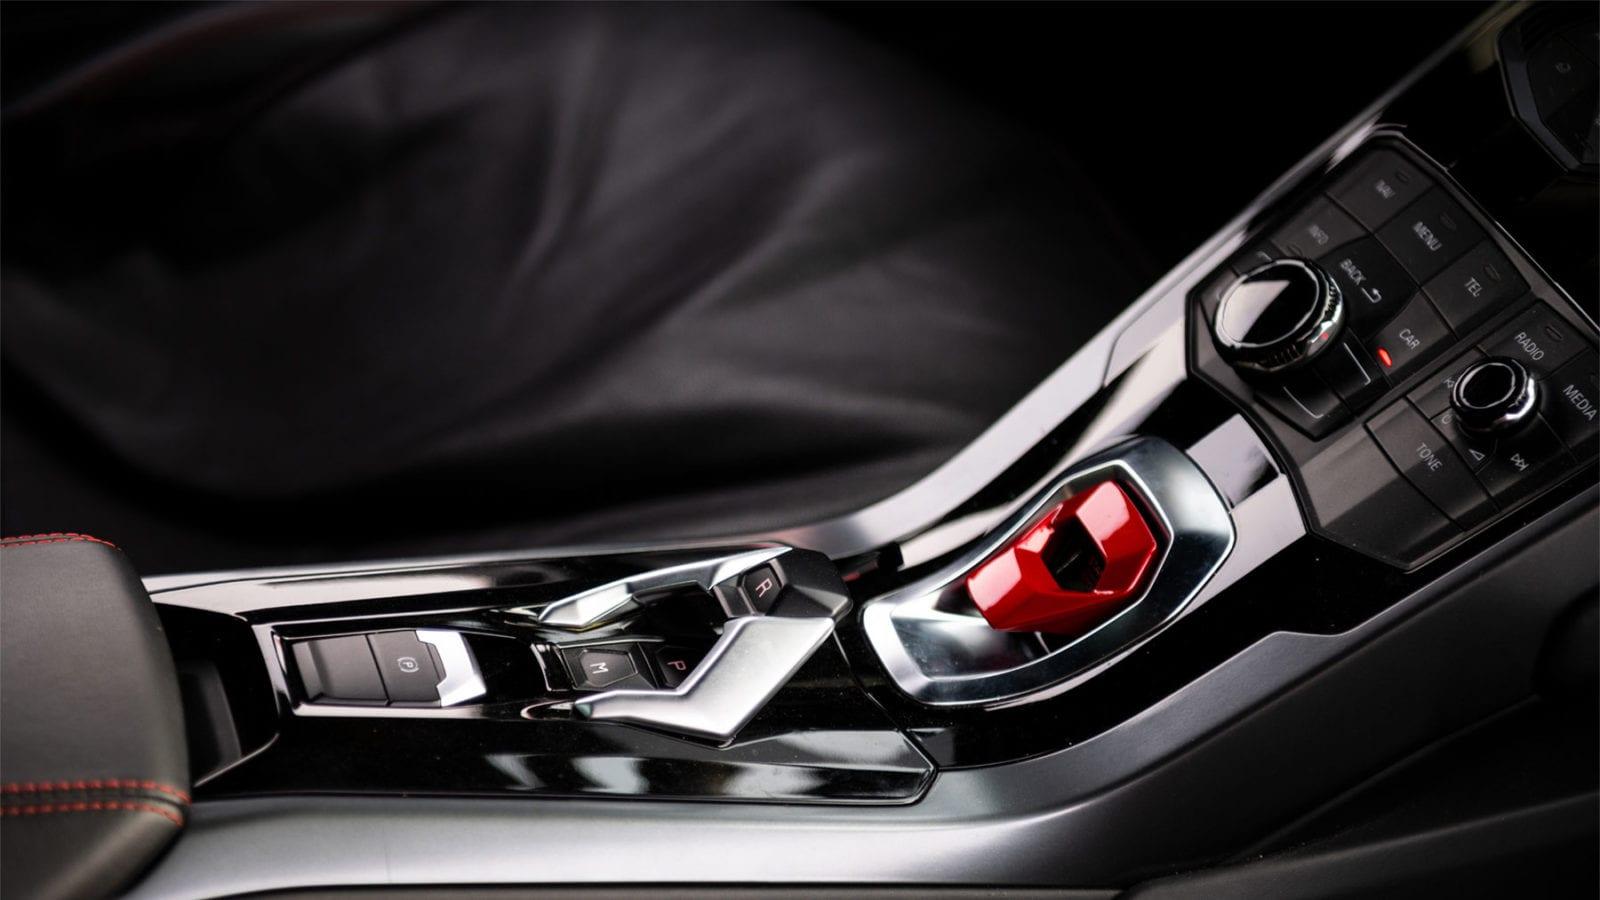 Lamborghini Huracan engine start button